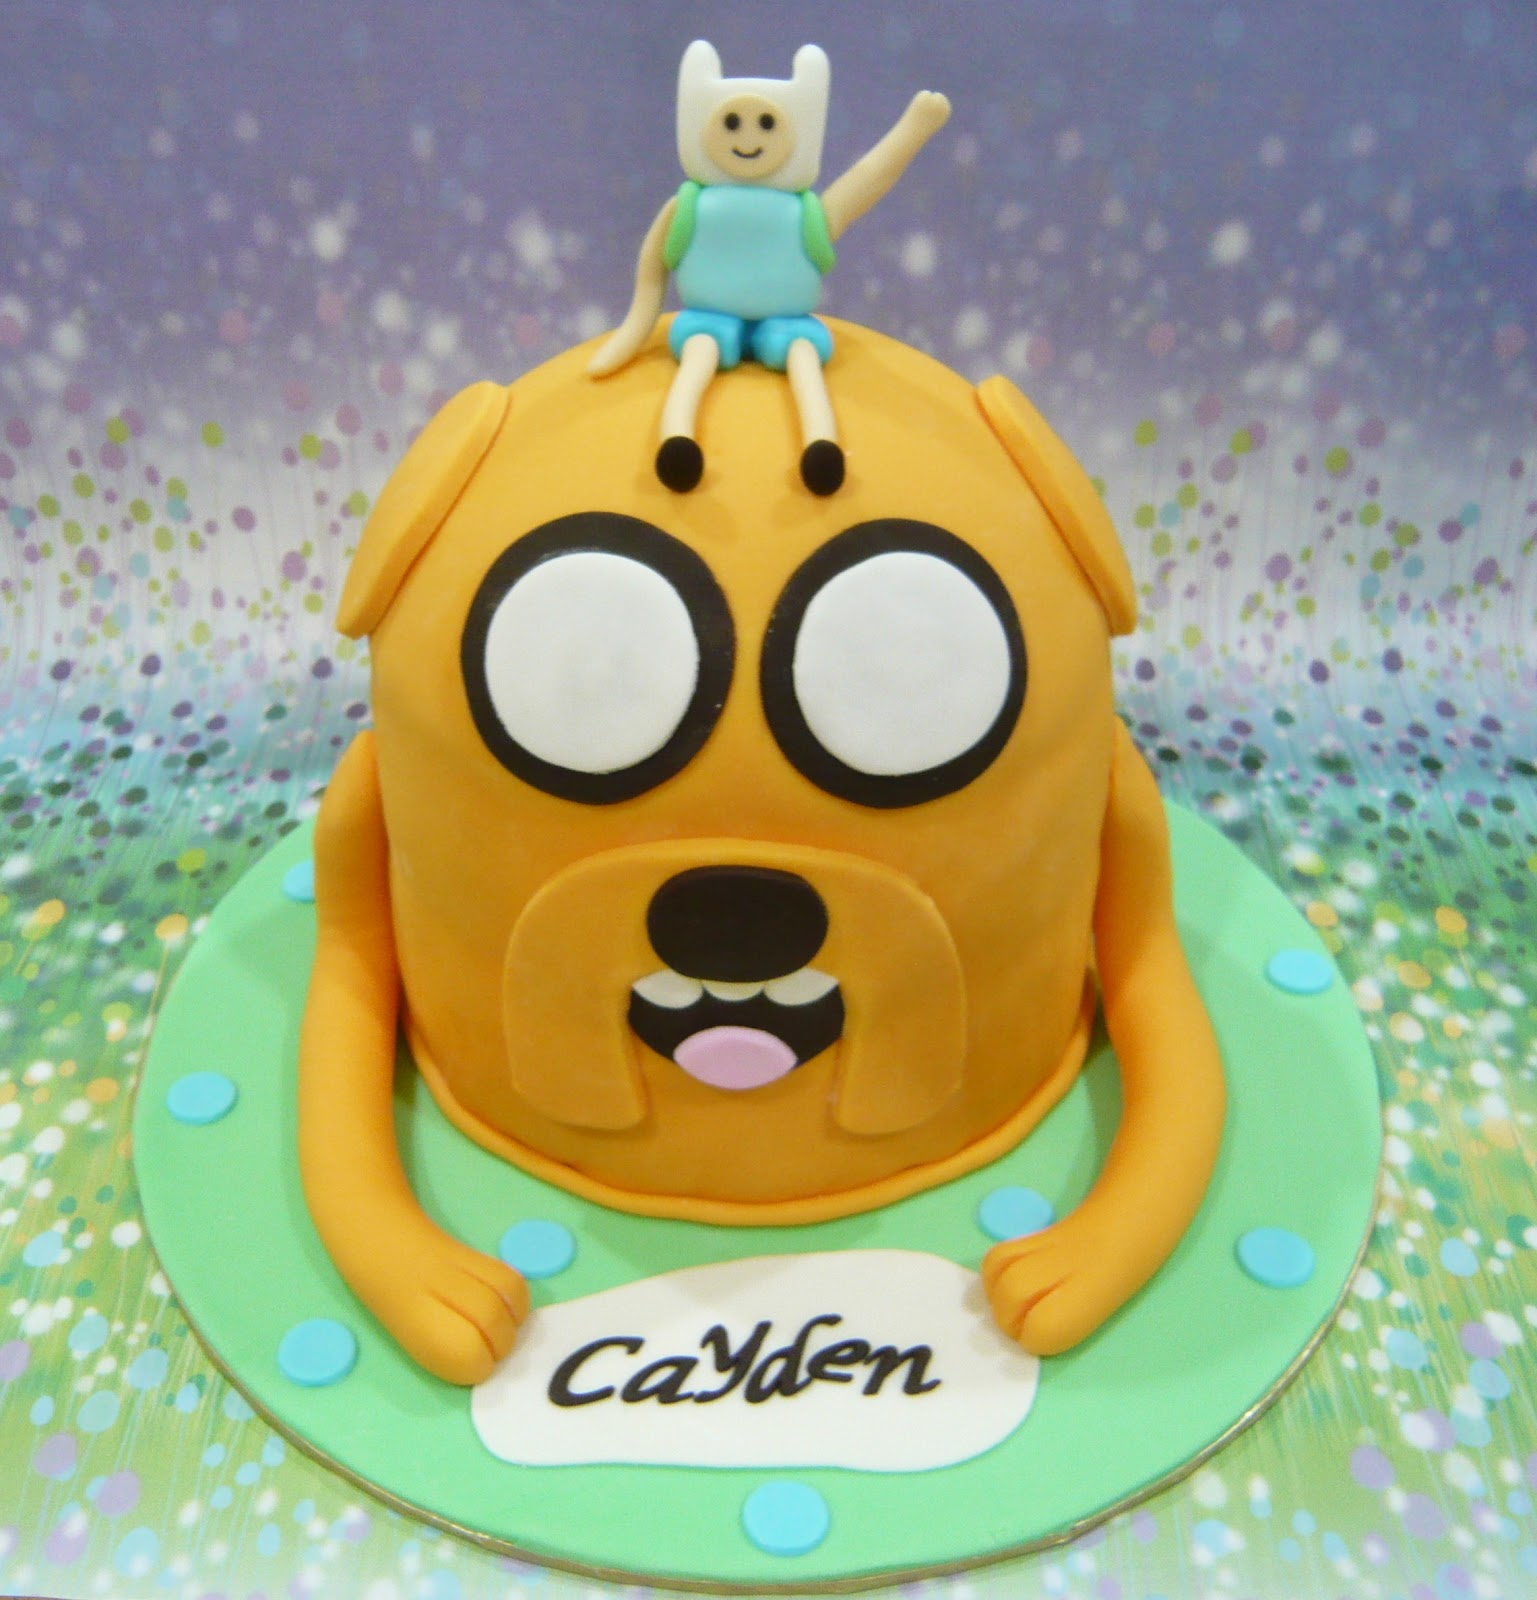 jenn cupcakes muffins adventure time cake